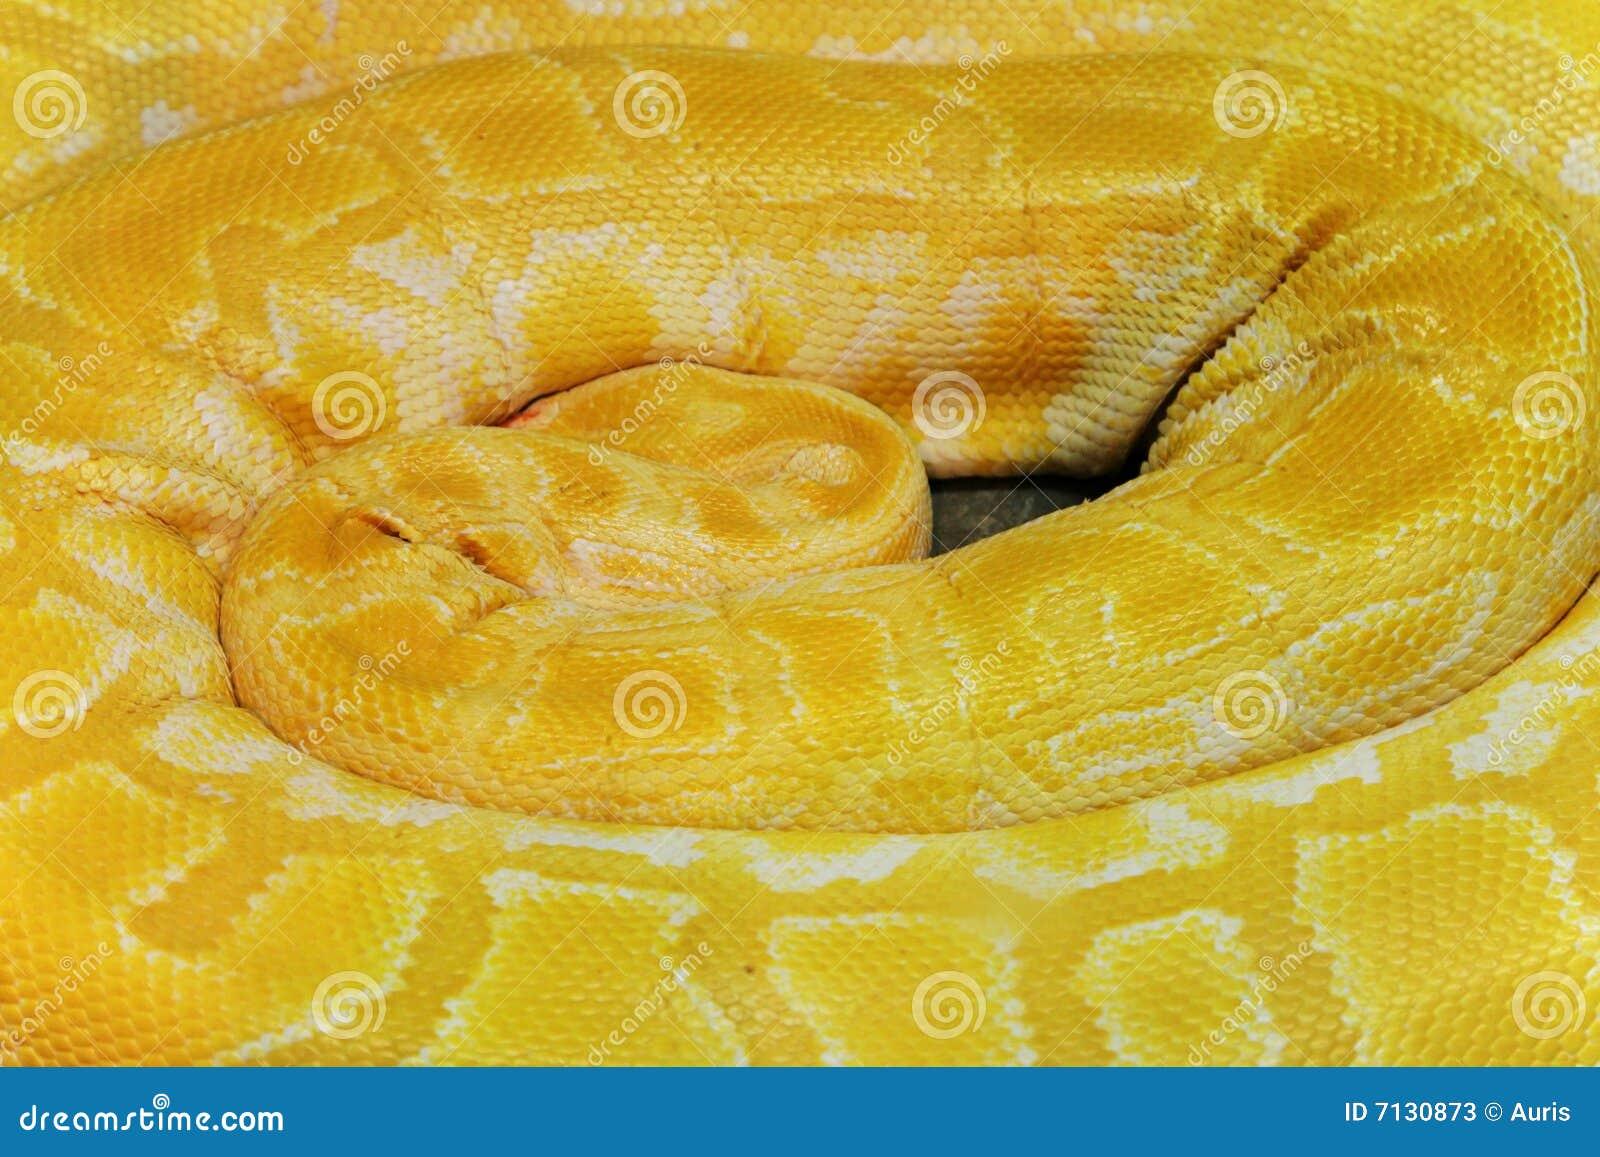 Coil Up Yellow Boa Stock Photos Image 7130873